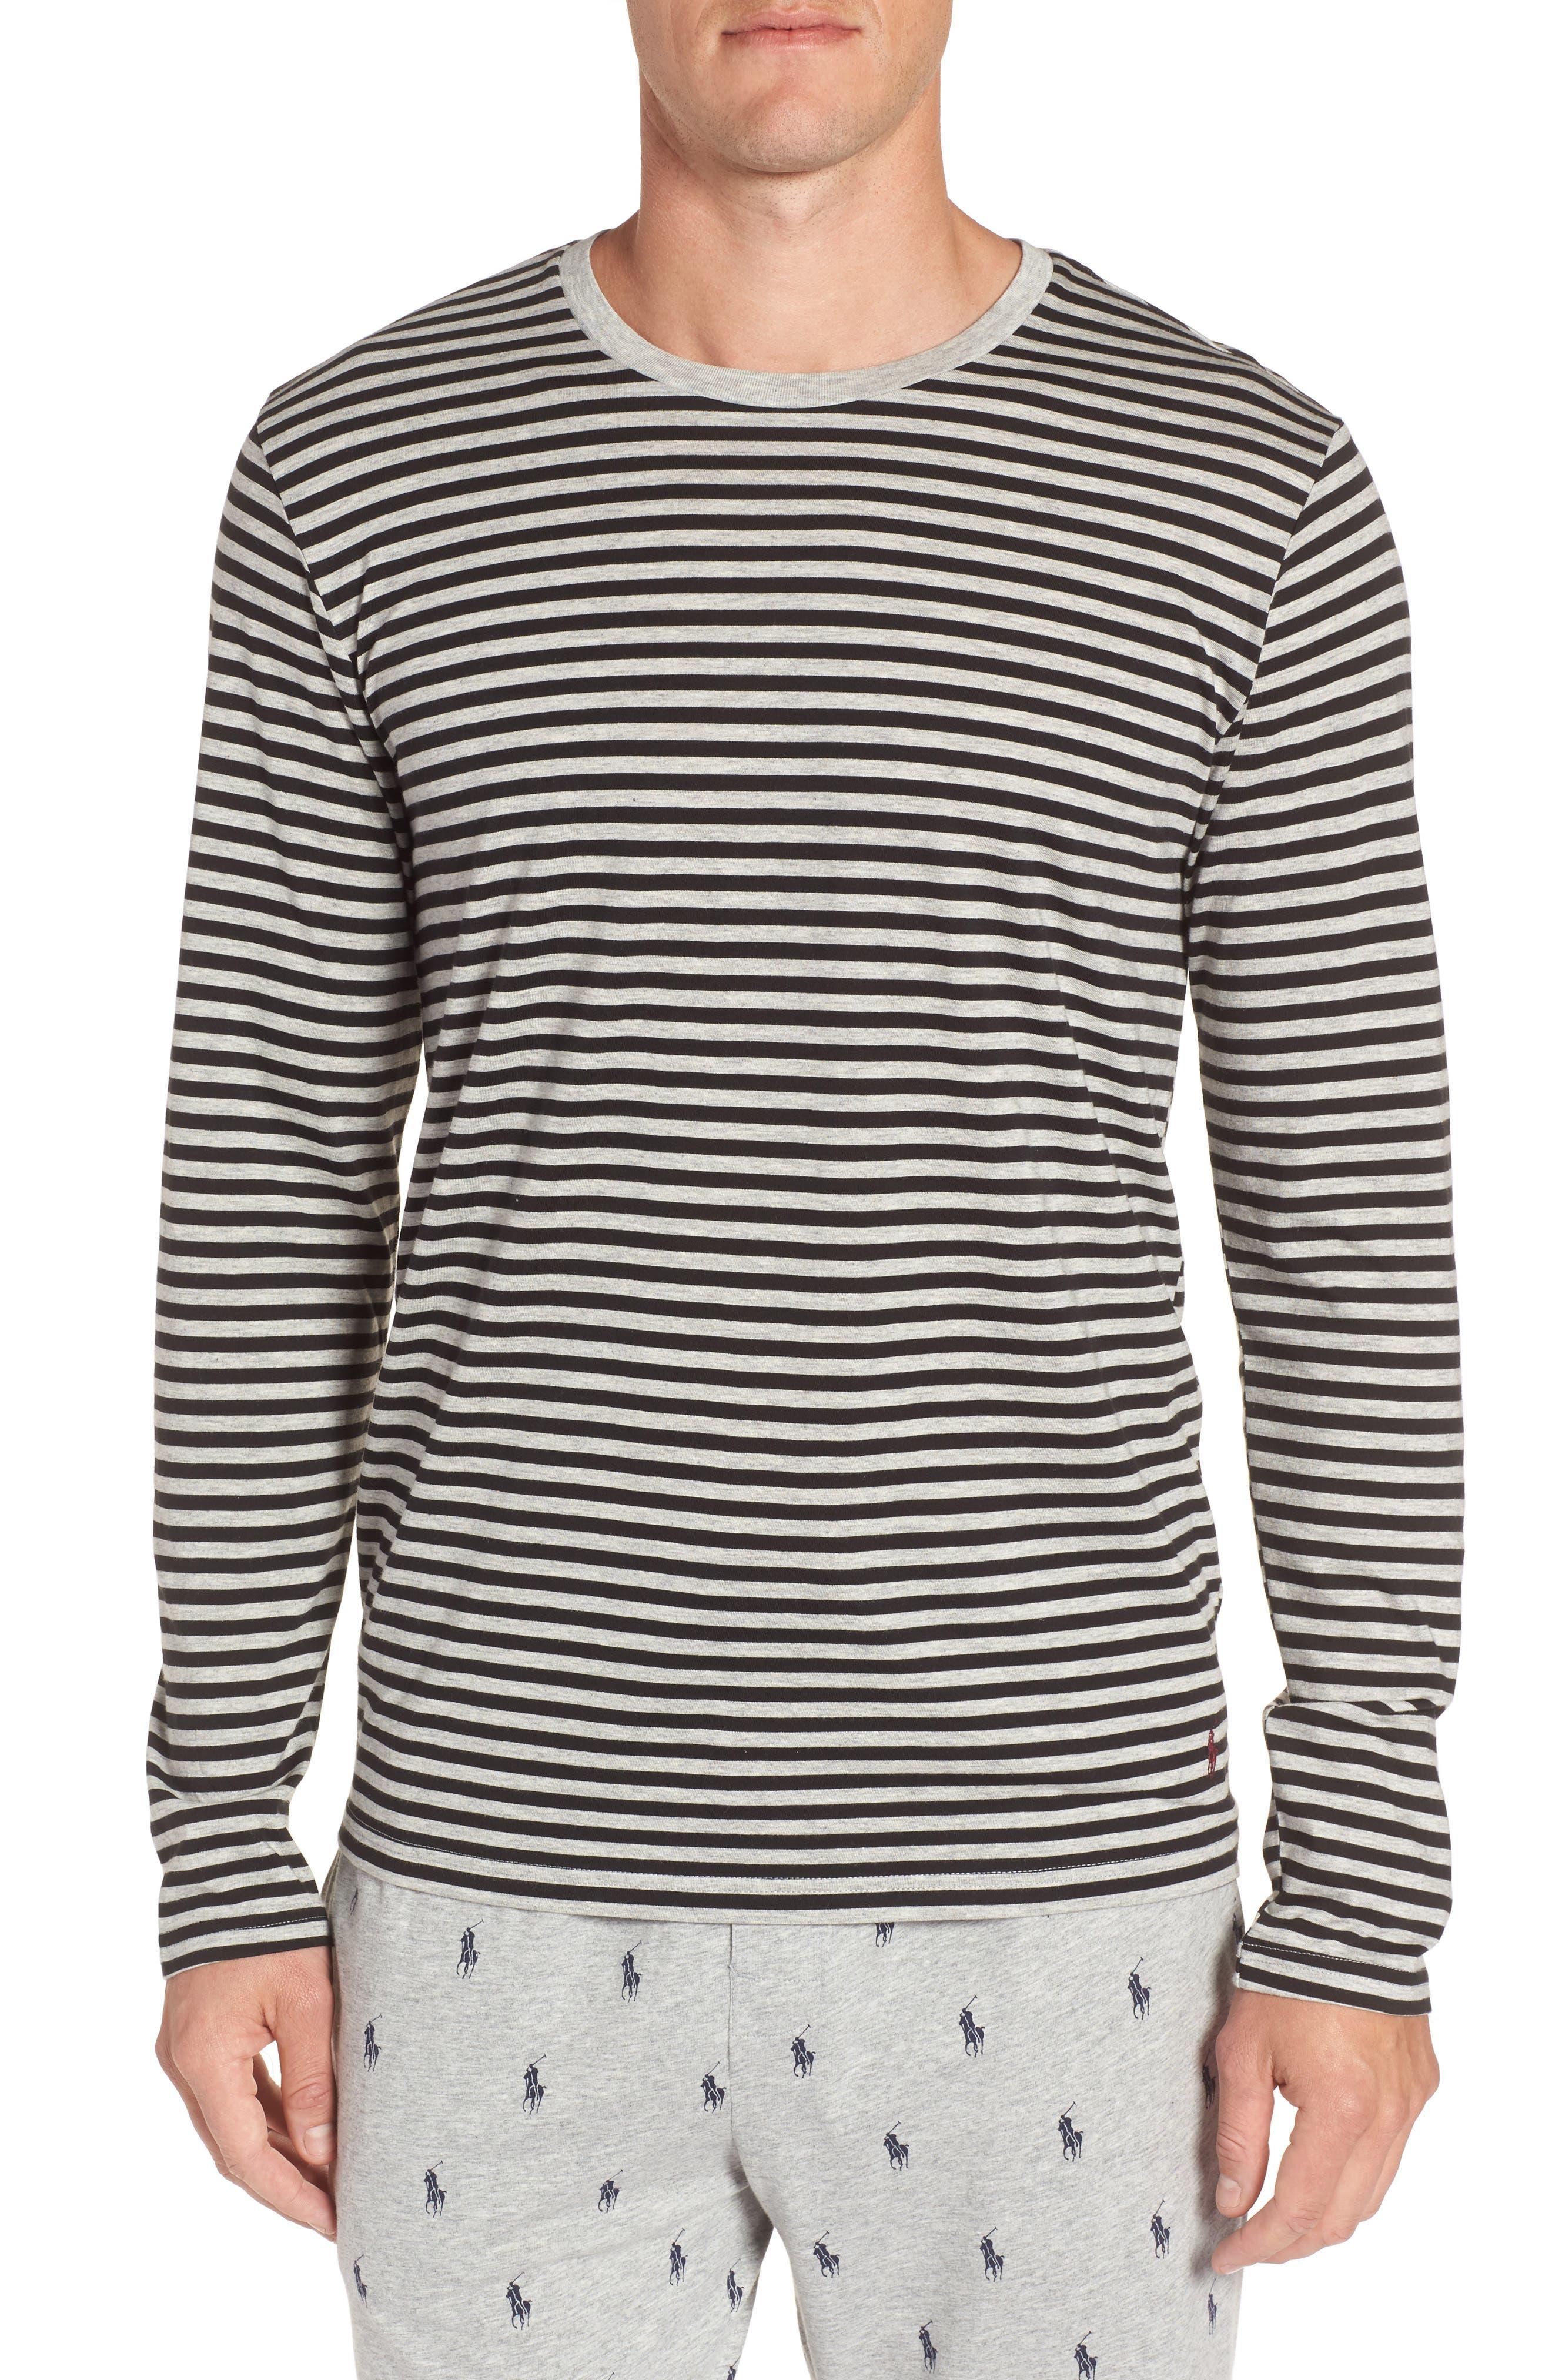 Main Image - Polo Ralph Lauren Supreme Comfort Cotton & Modal T-Shirt